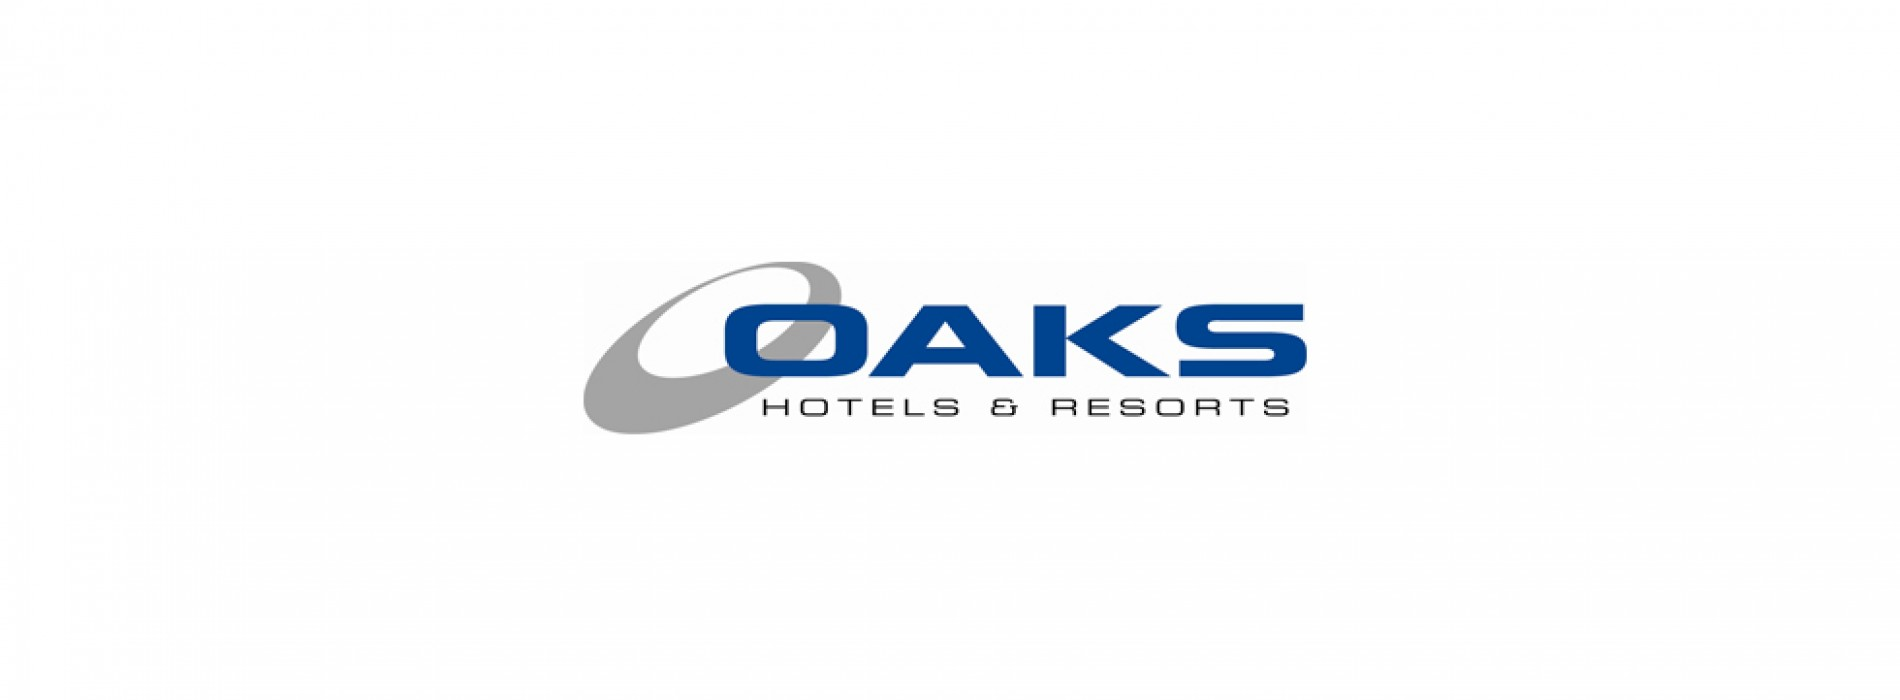 Oaks debuts in India with opening of Oaks Bodhgaya